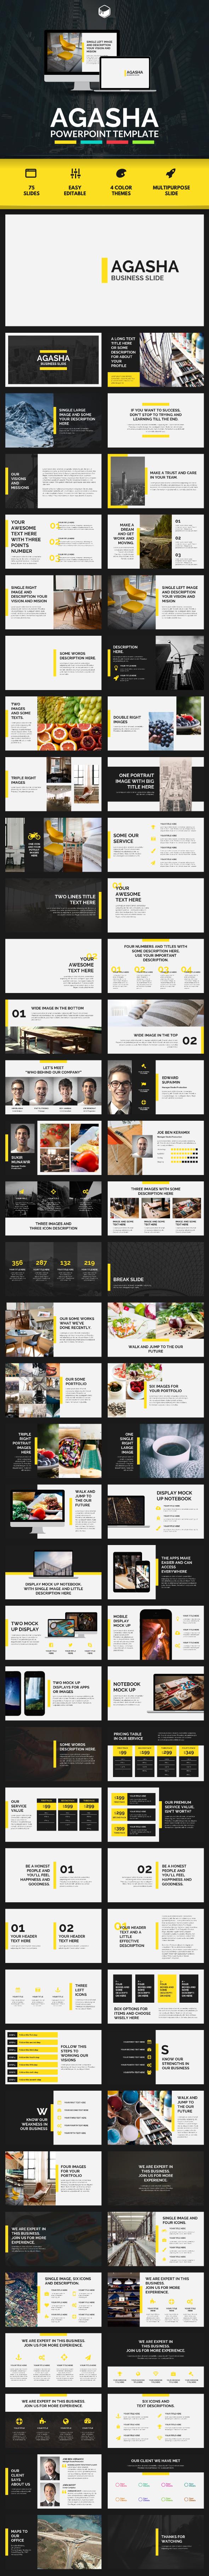 AGASHA - PowerPoint Template by descarteshouston | GraphicRiver